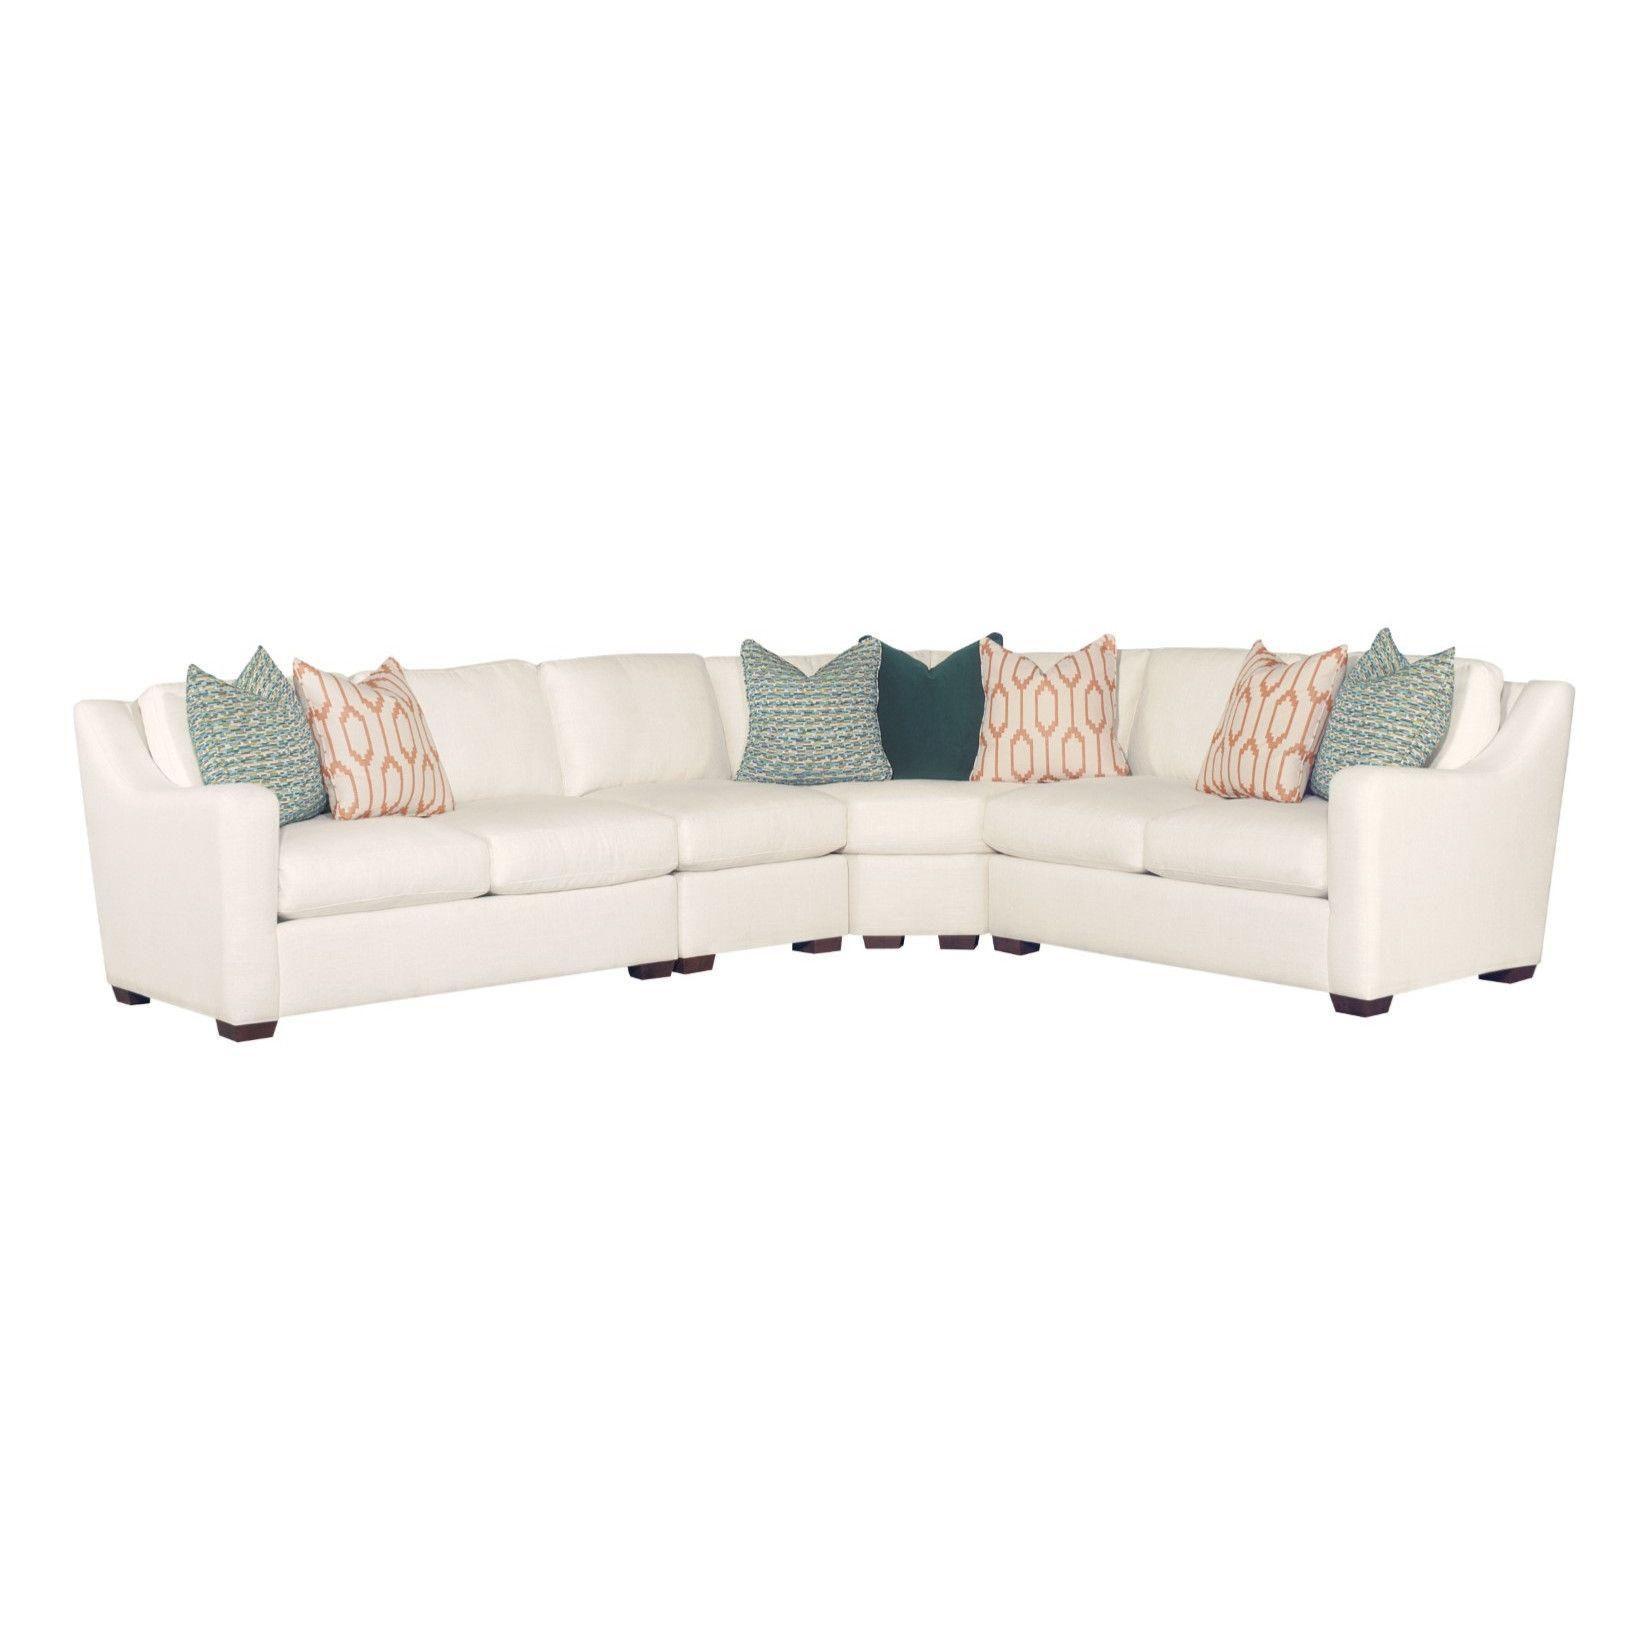 Aria Designs Carter Sectional  sc 1 st  Pinterest : carter sectional sofa - Sectionals, Sofas & Couches